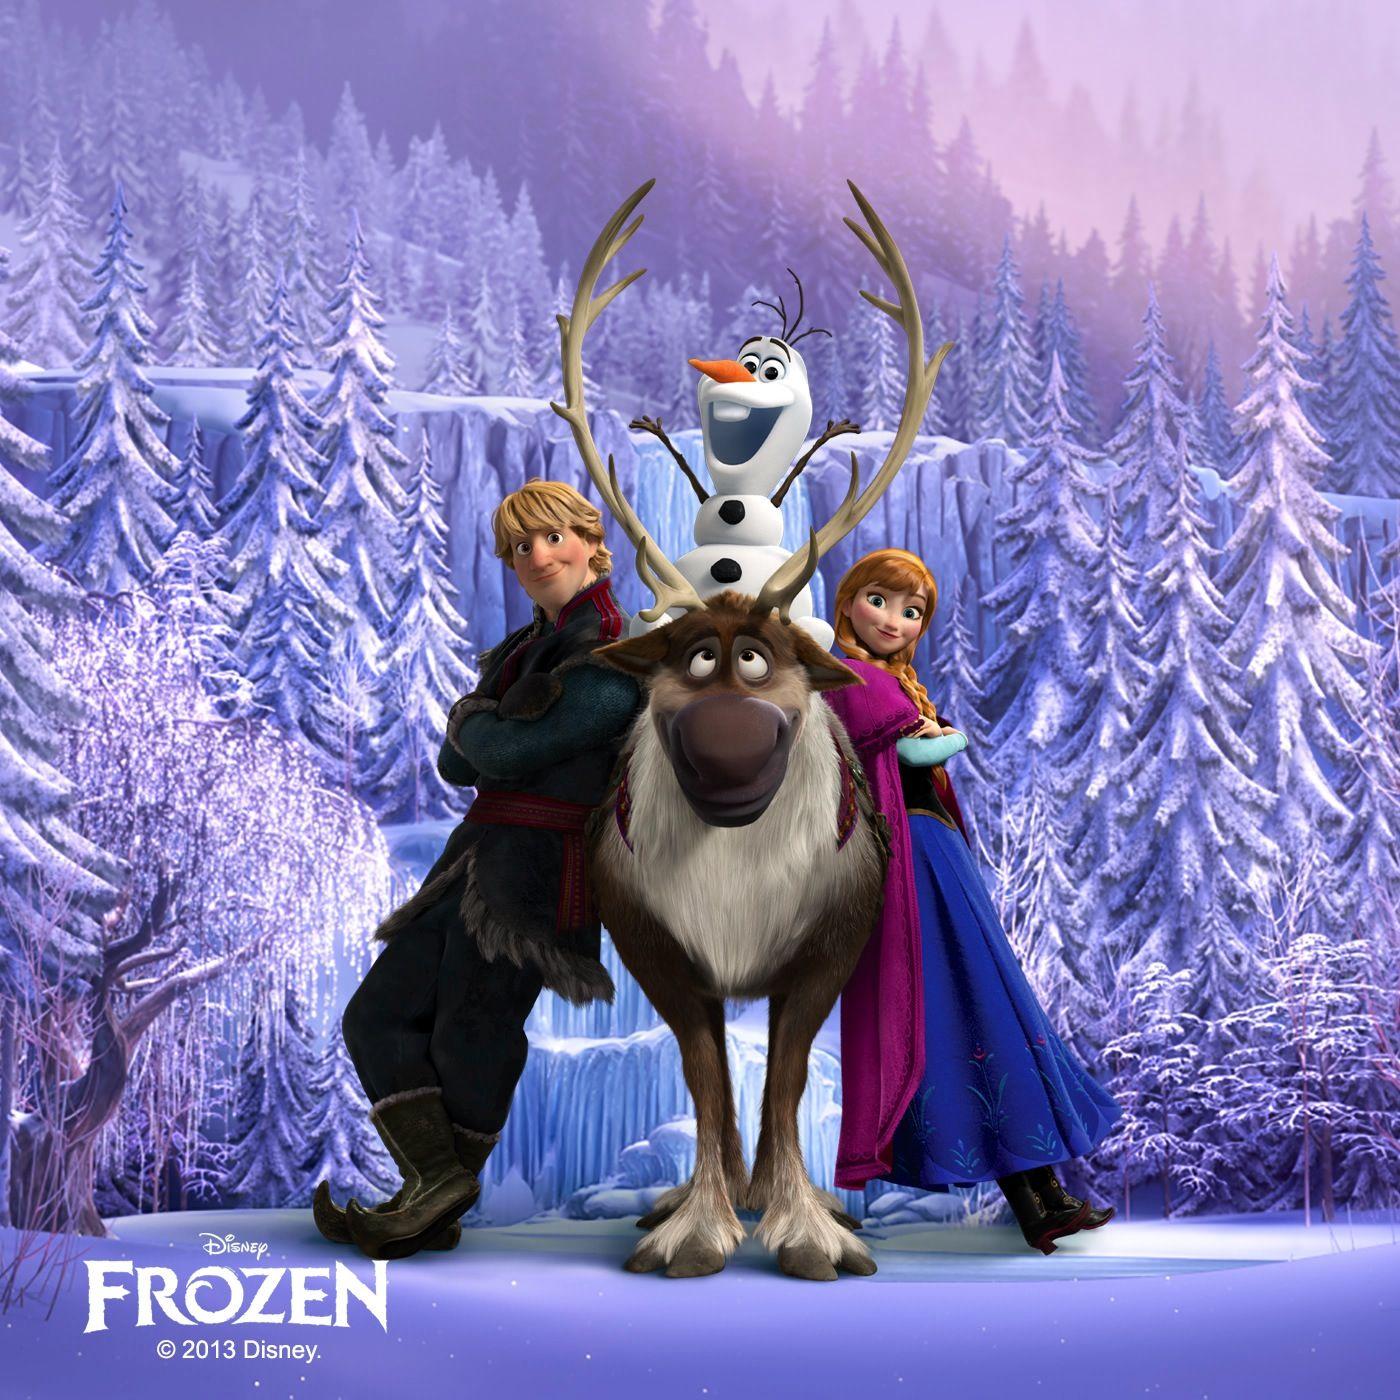 Anna kristoff sven olaf frozen isney ixar - Frozen anna and olaf ...